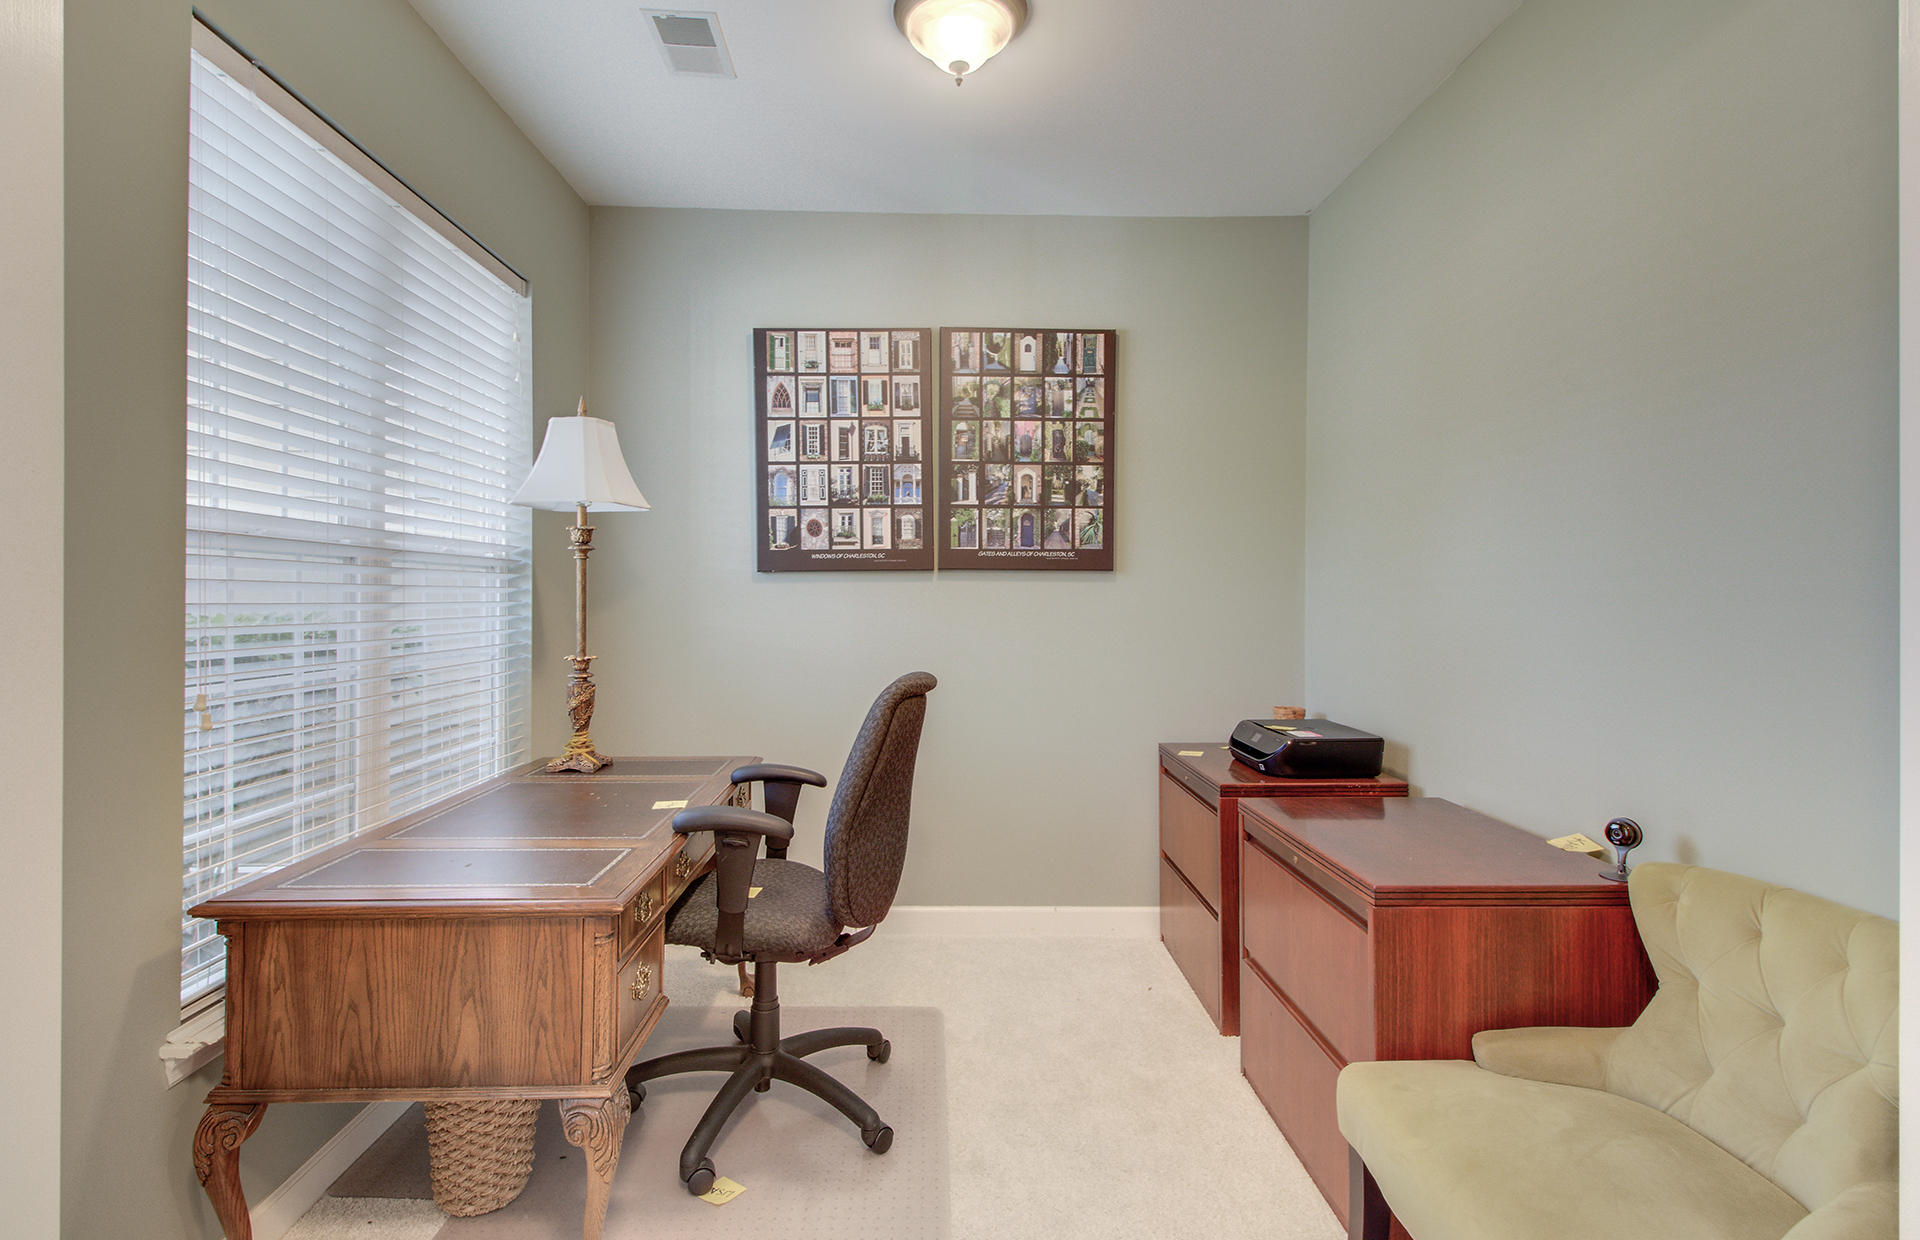 Dunes West Homes For Sale - 145 Fresh Meadow, Mount Pleasant, SC - 6